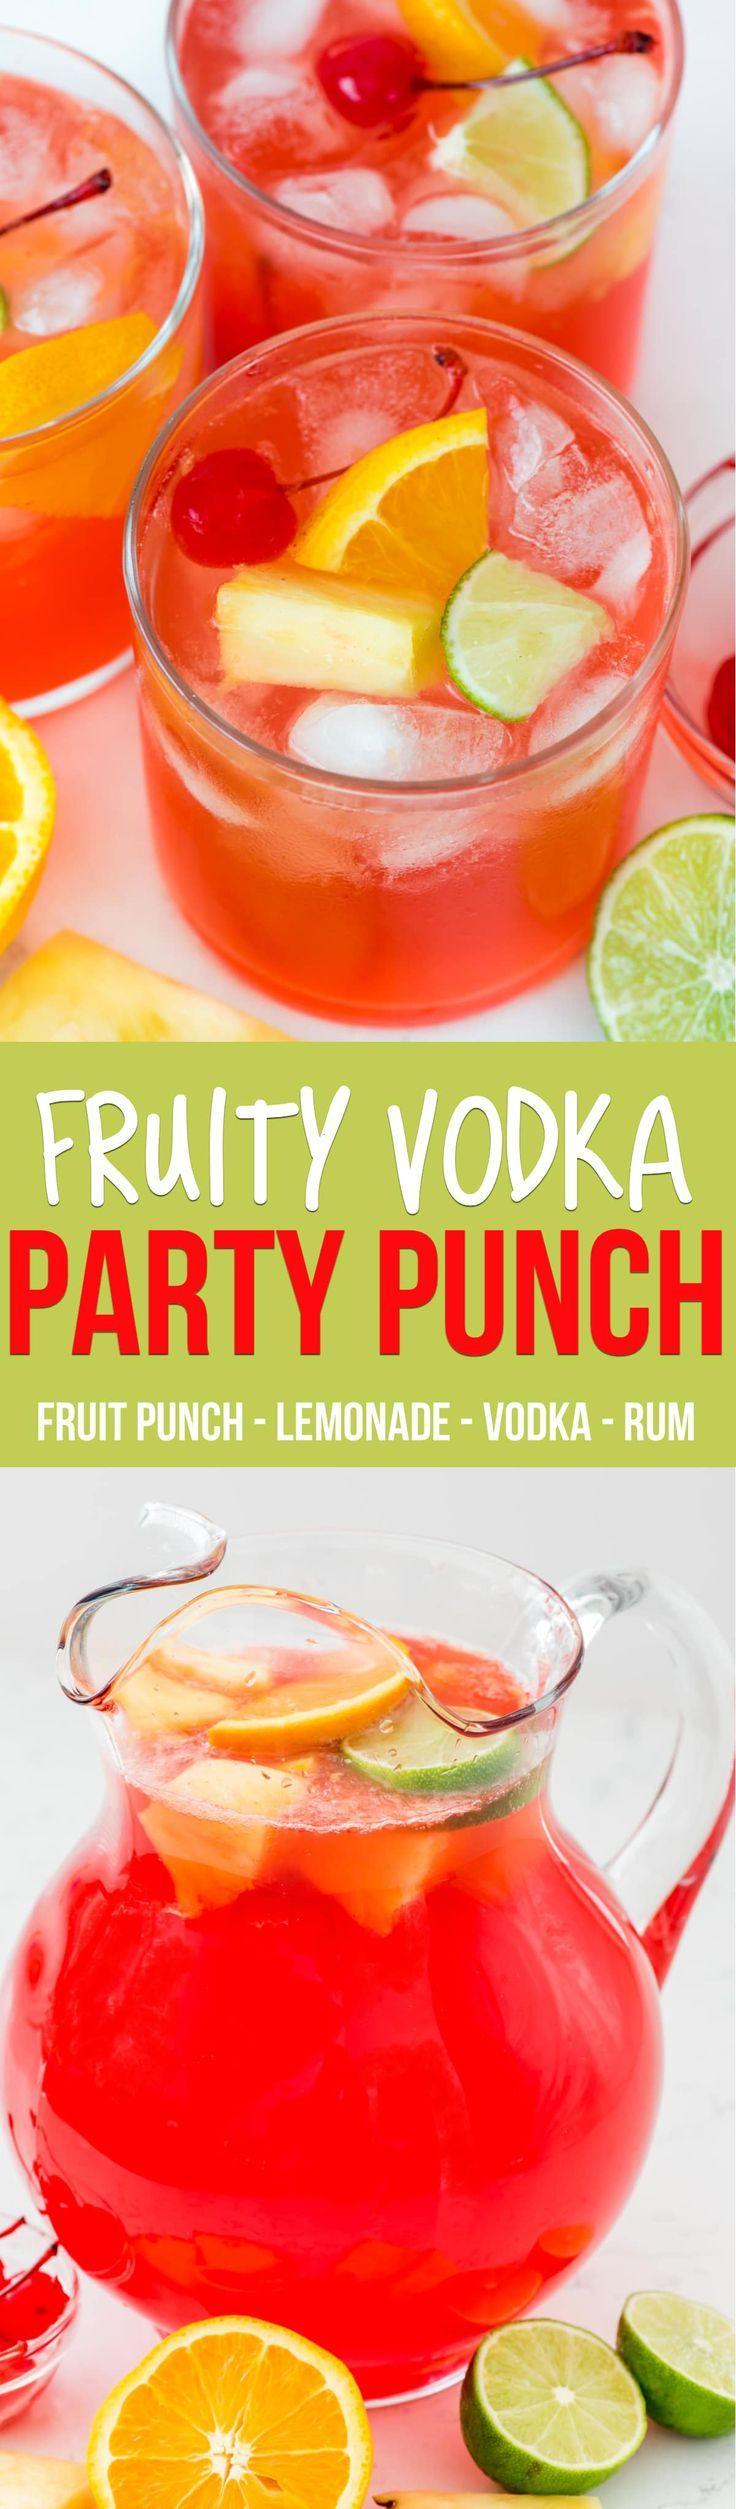 Wedding - Drinks/ Cocktails